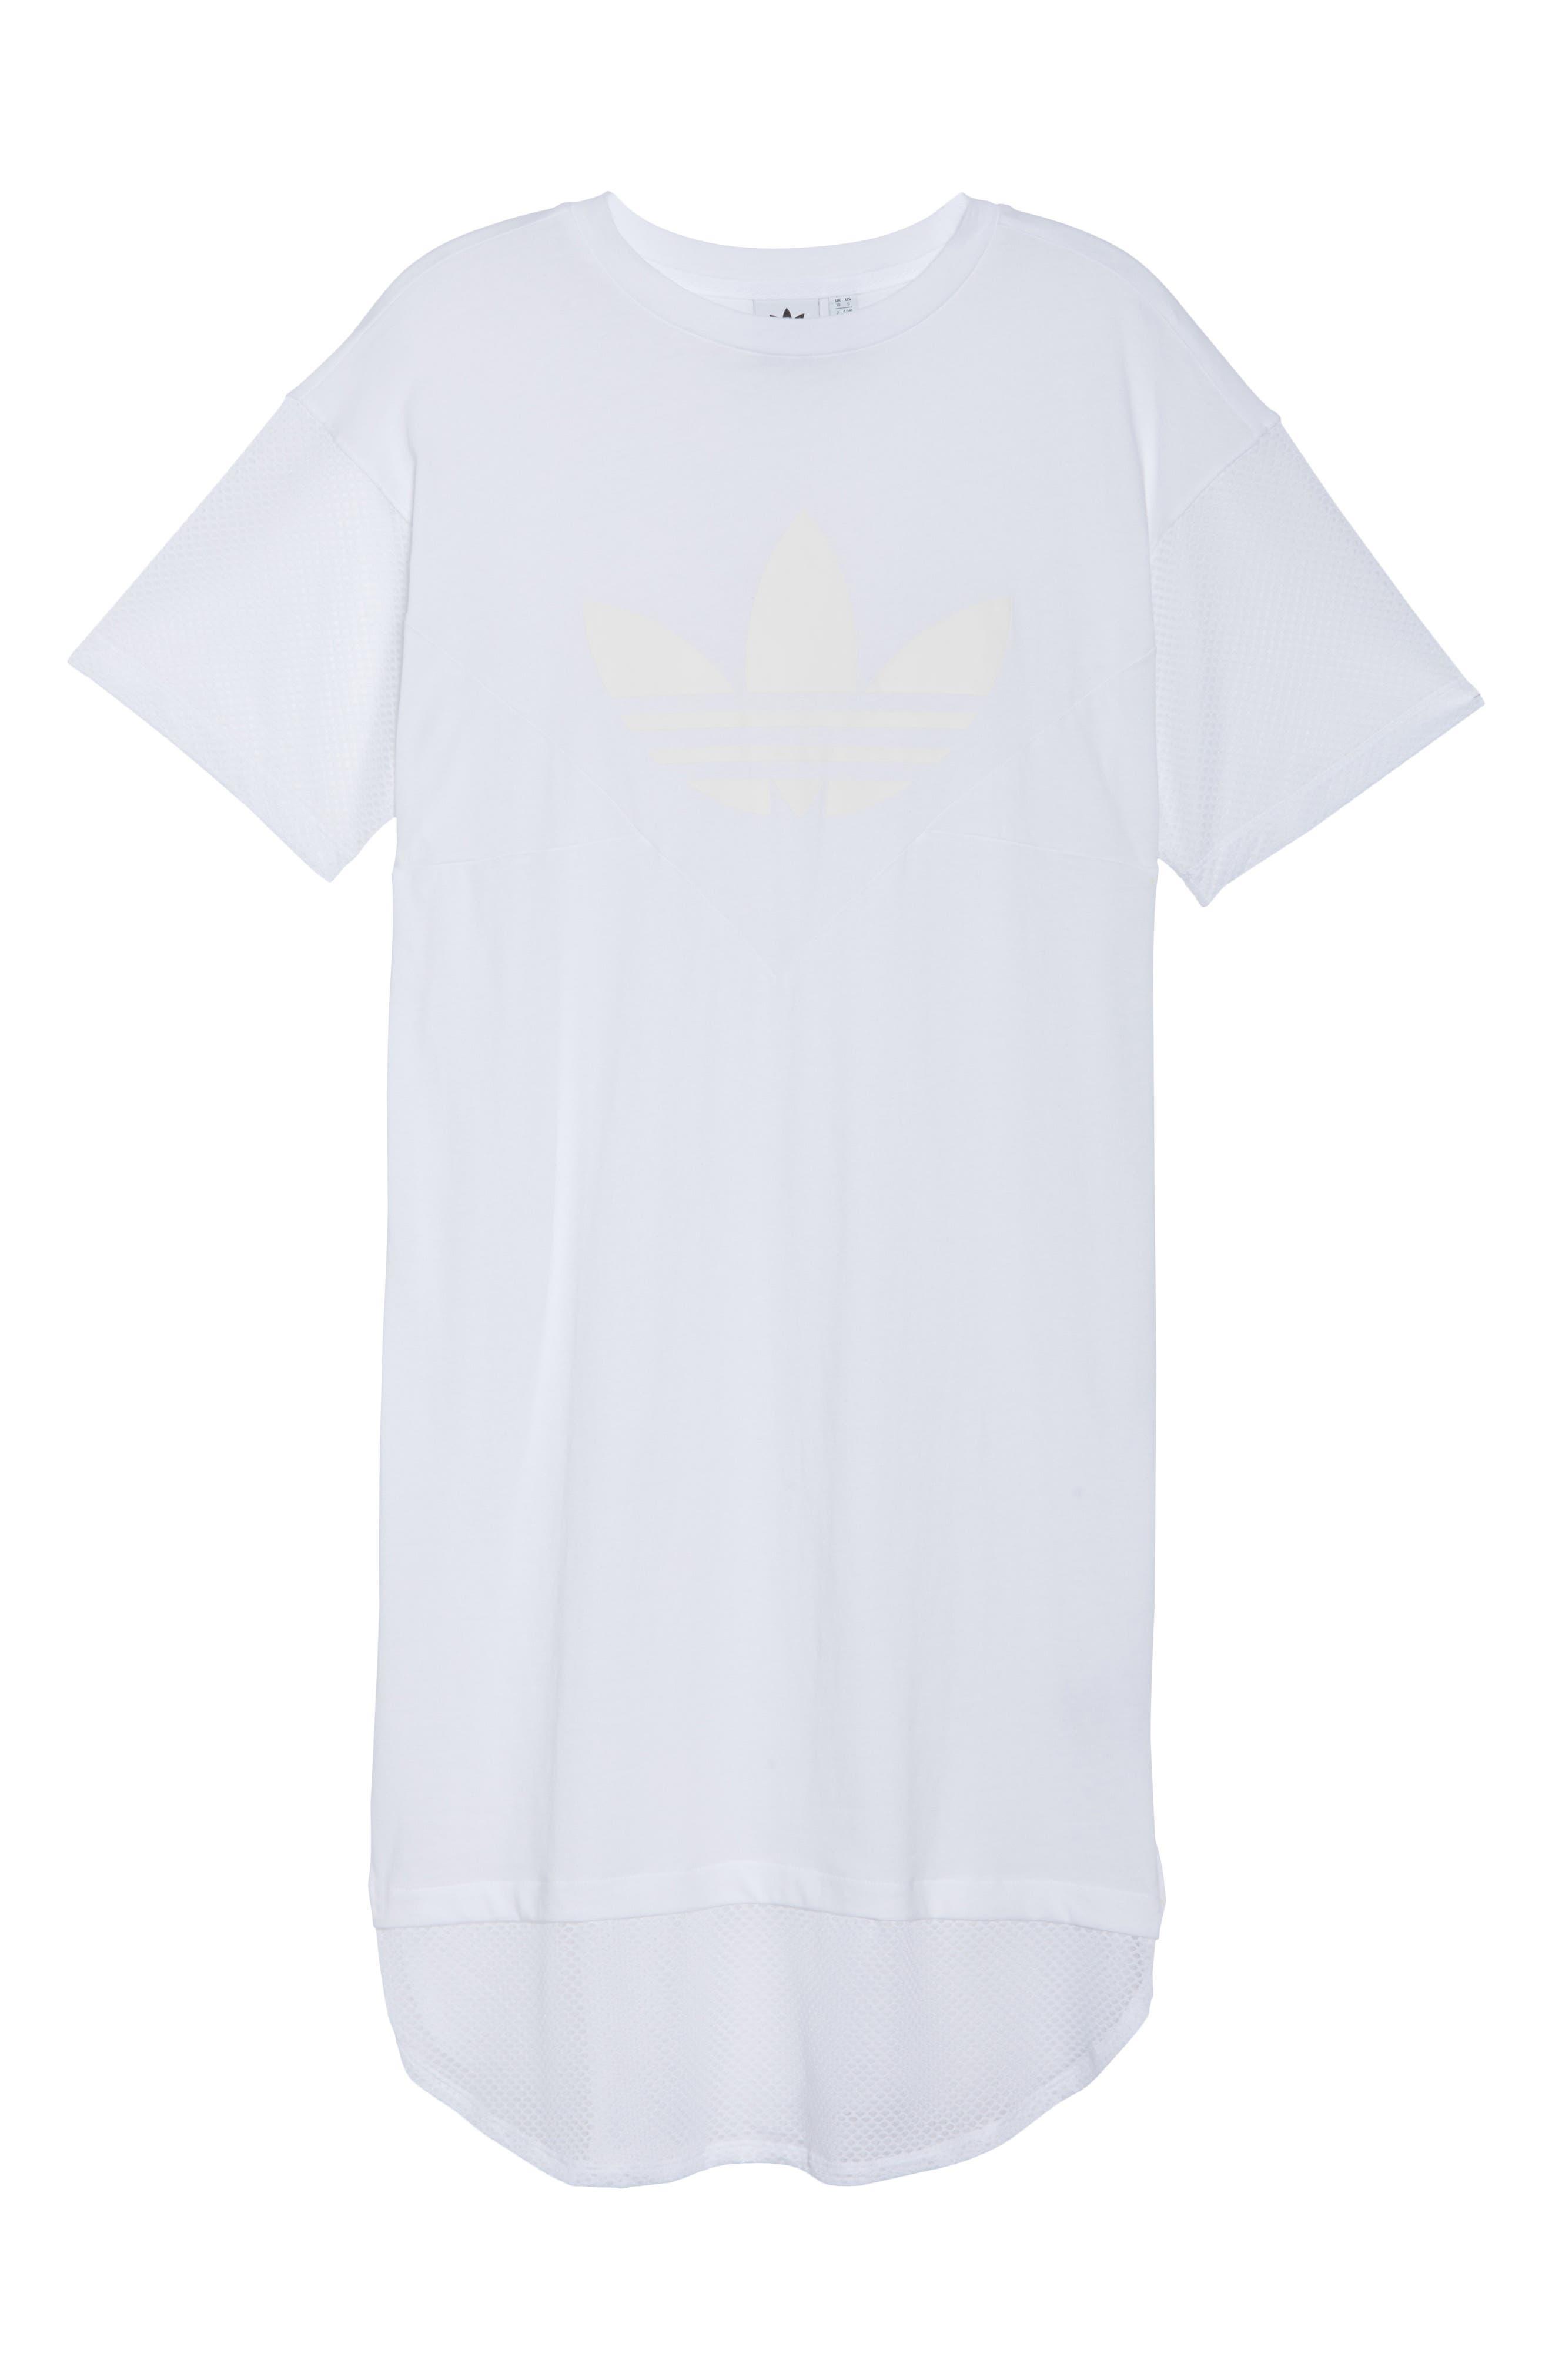 CLRDO T-Shirt Dress,                             Alternate thumbnail 7, color,                             100